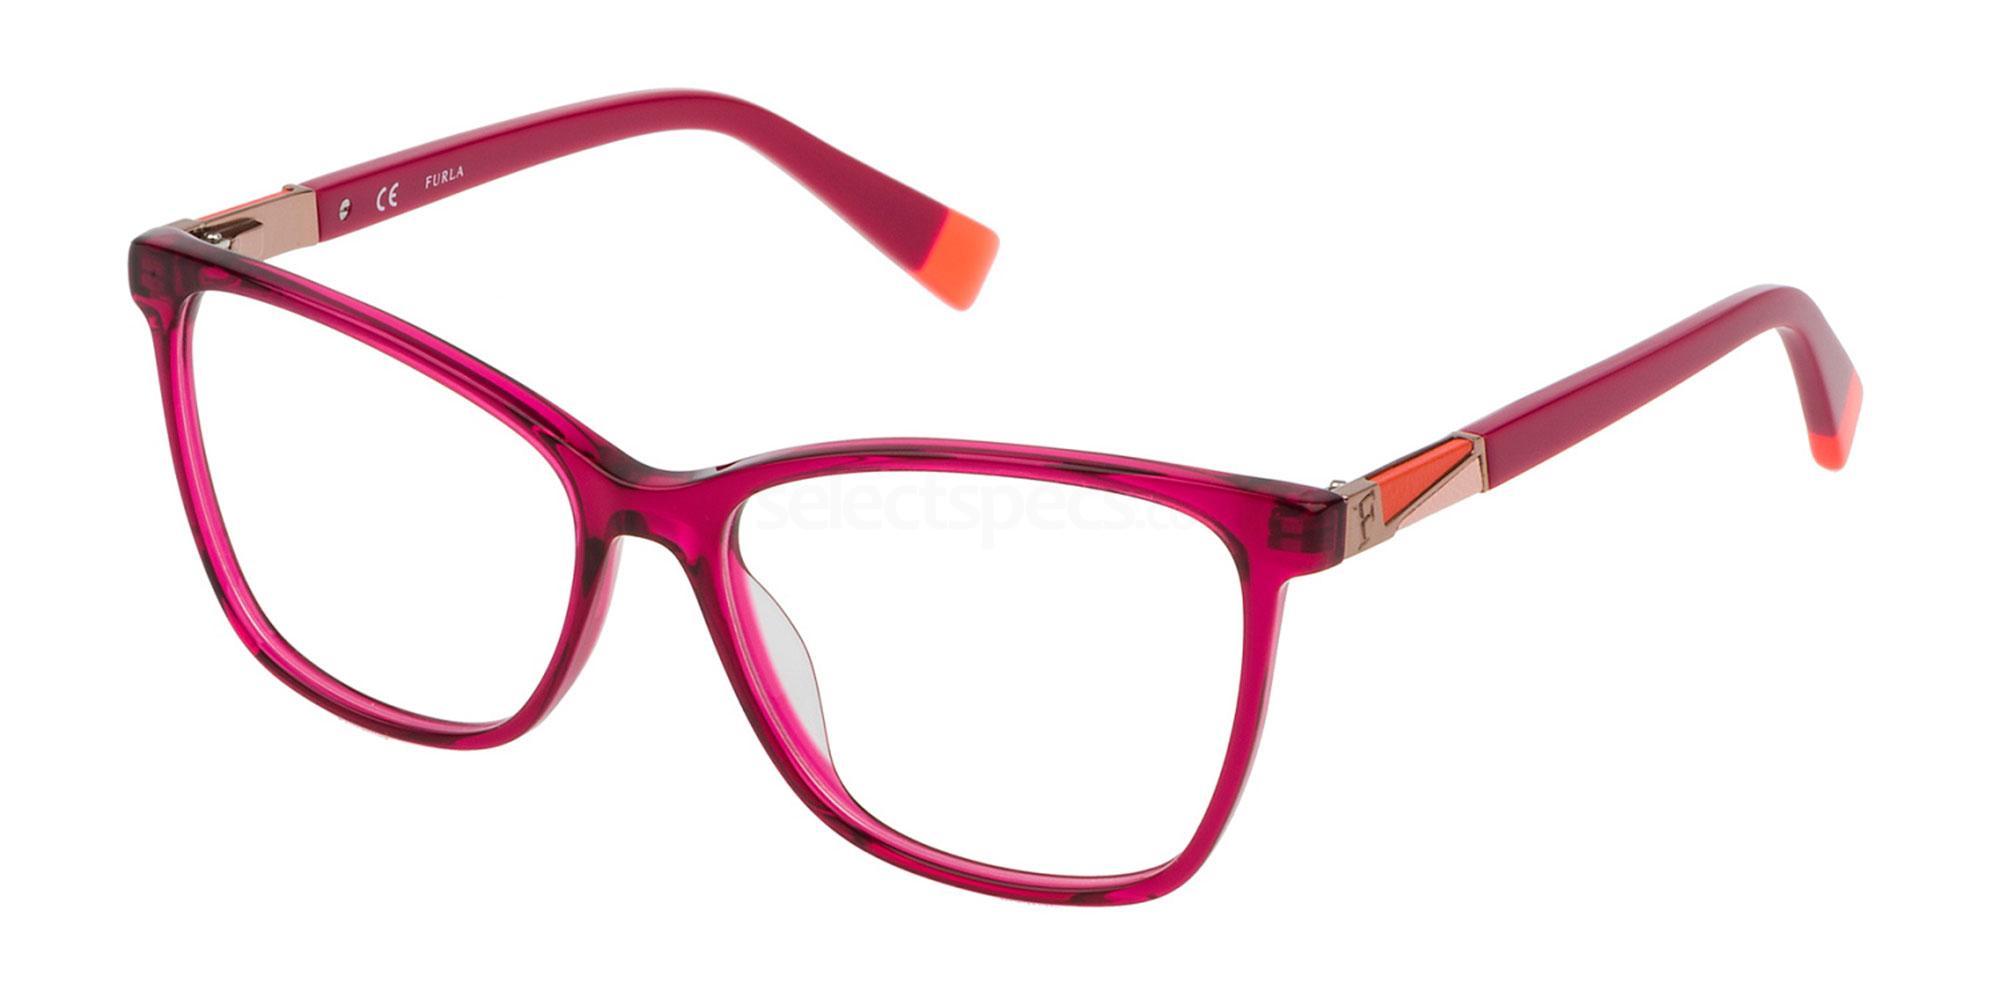 01BV VFU190 Glasses, Furla